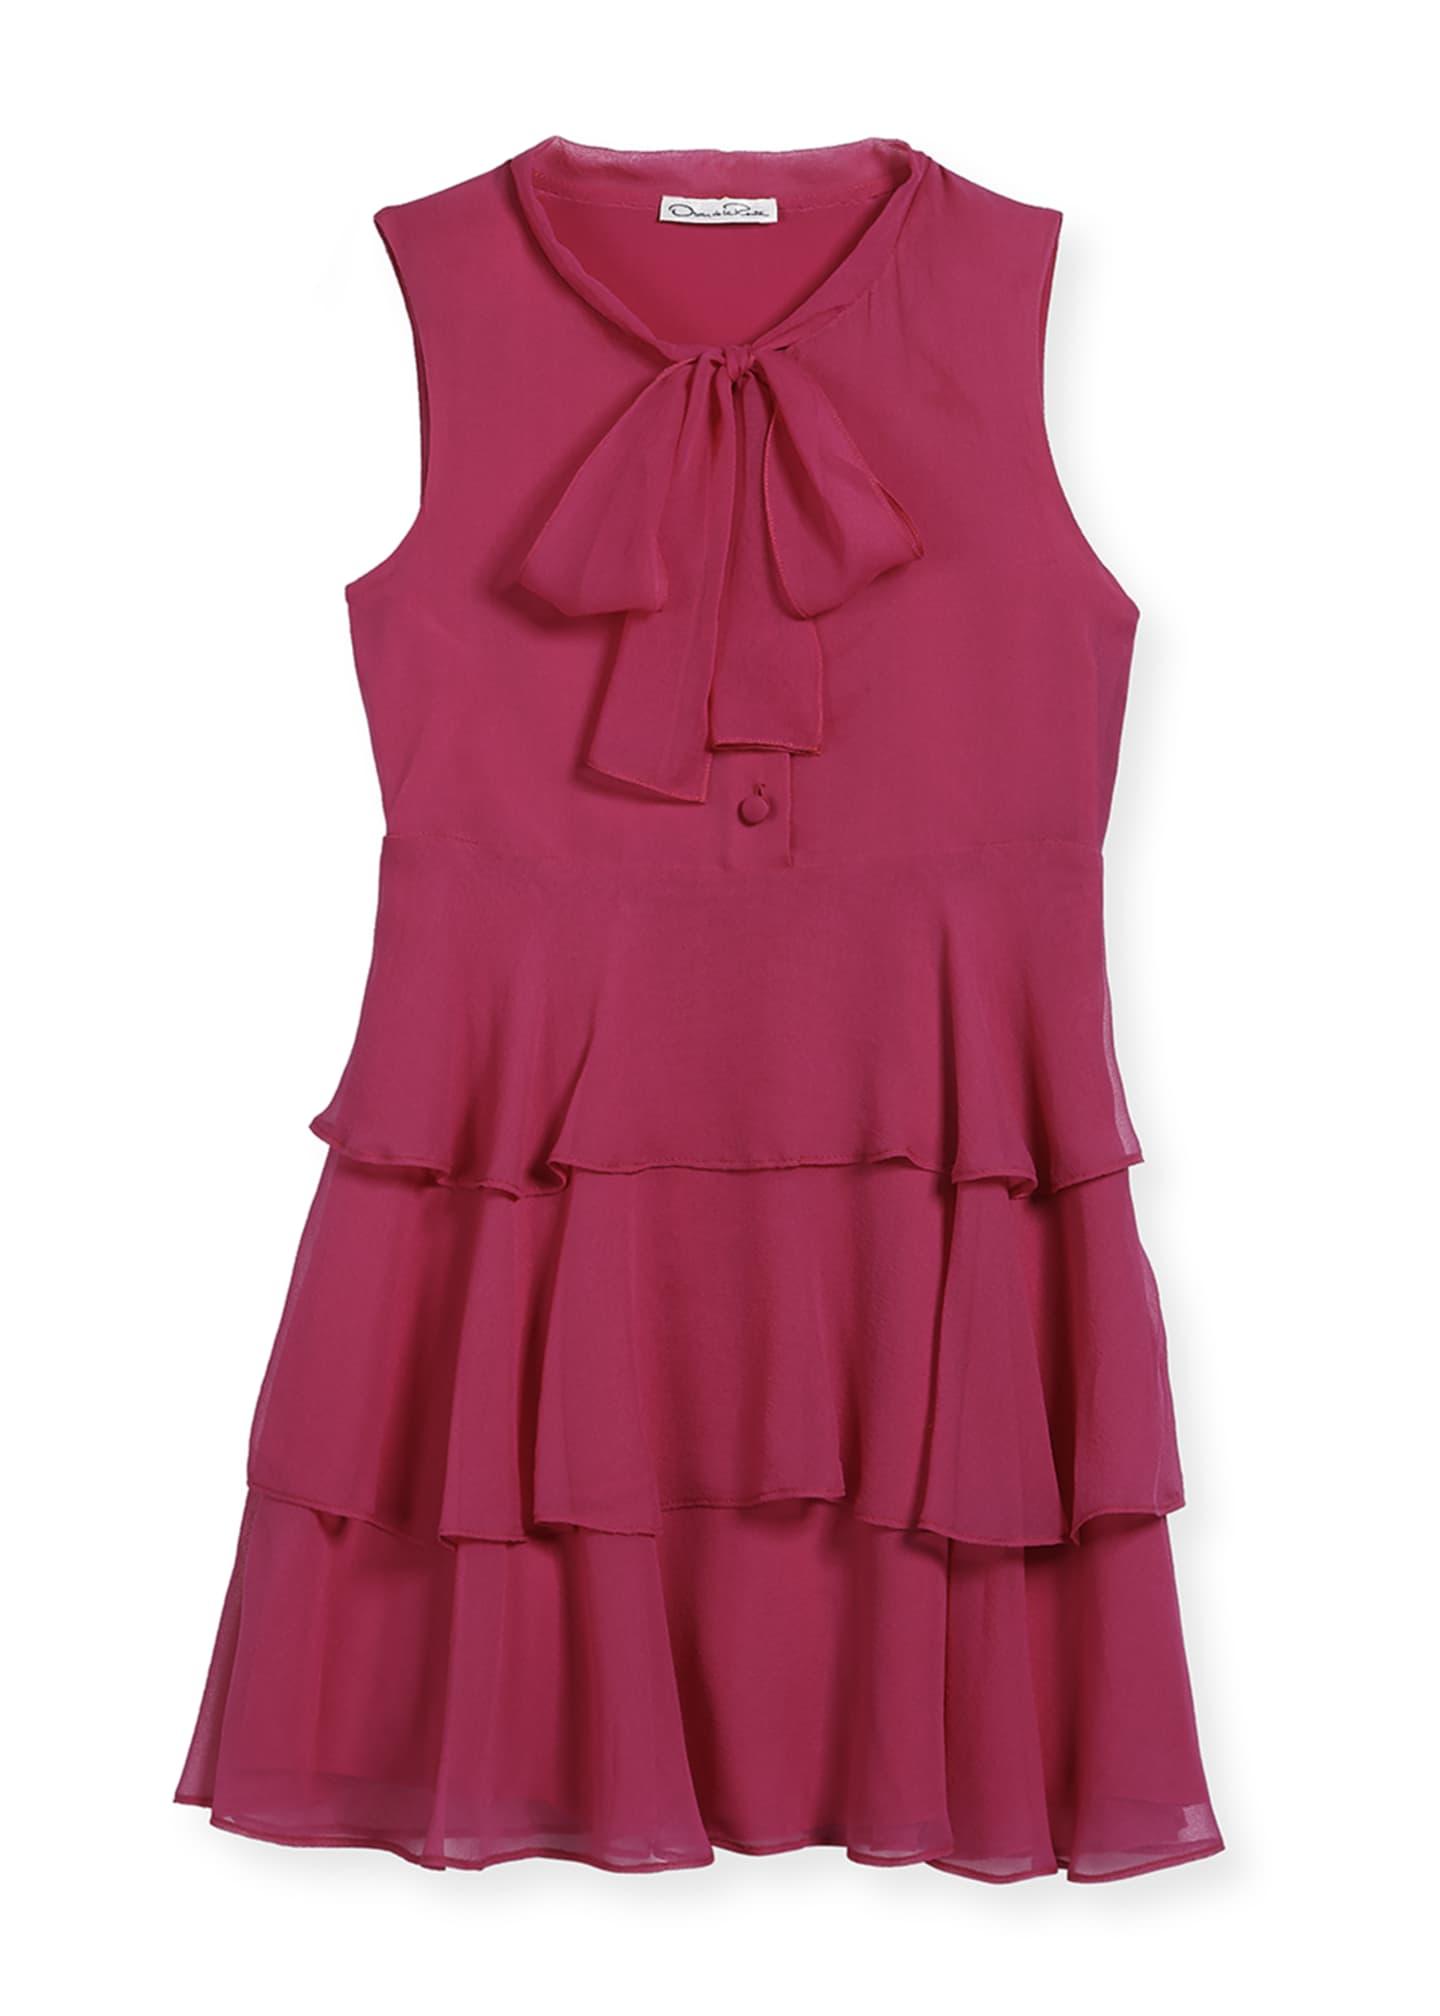 Oscar de la Renta Chiffon Bow Tiered Dress,